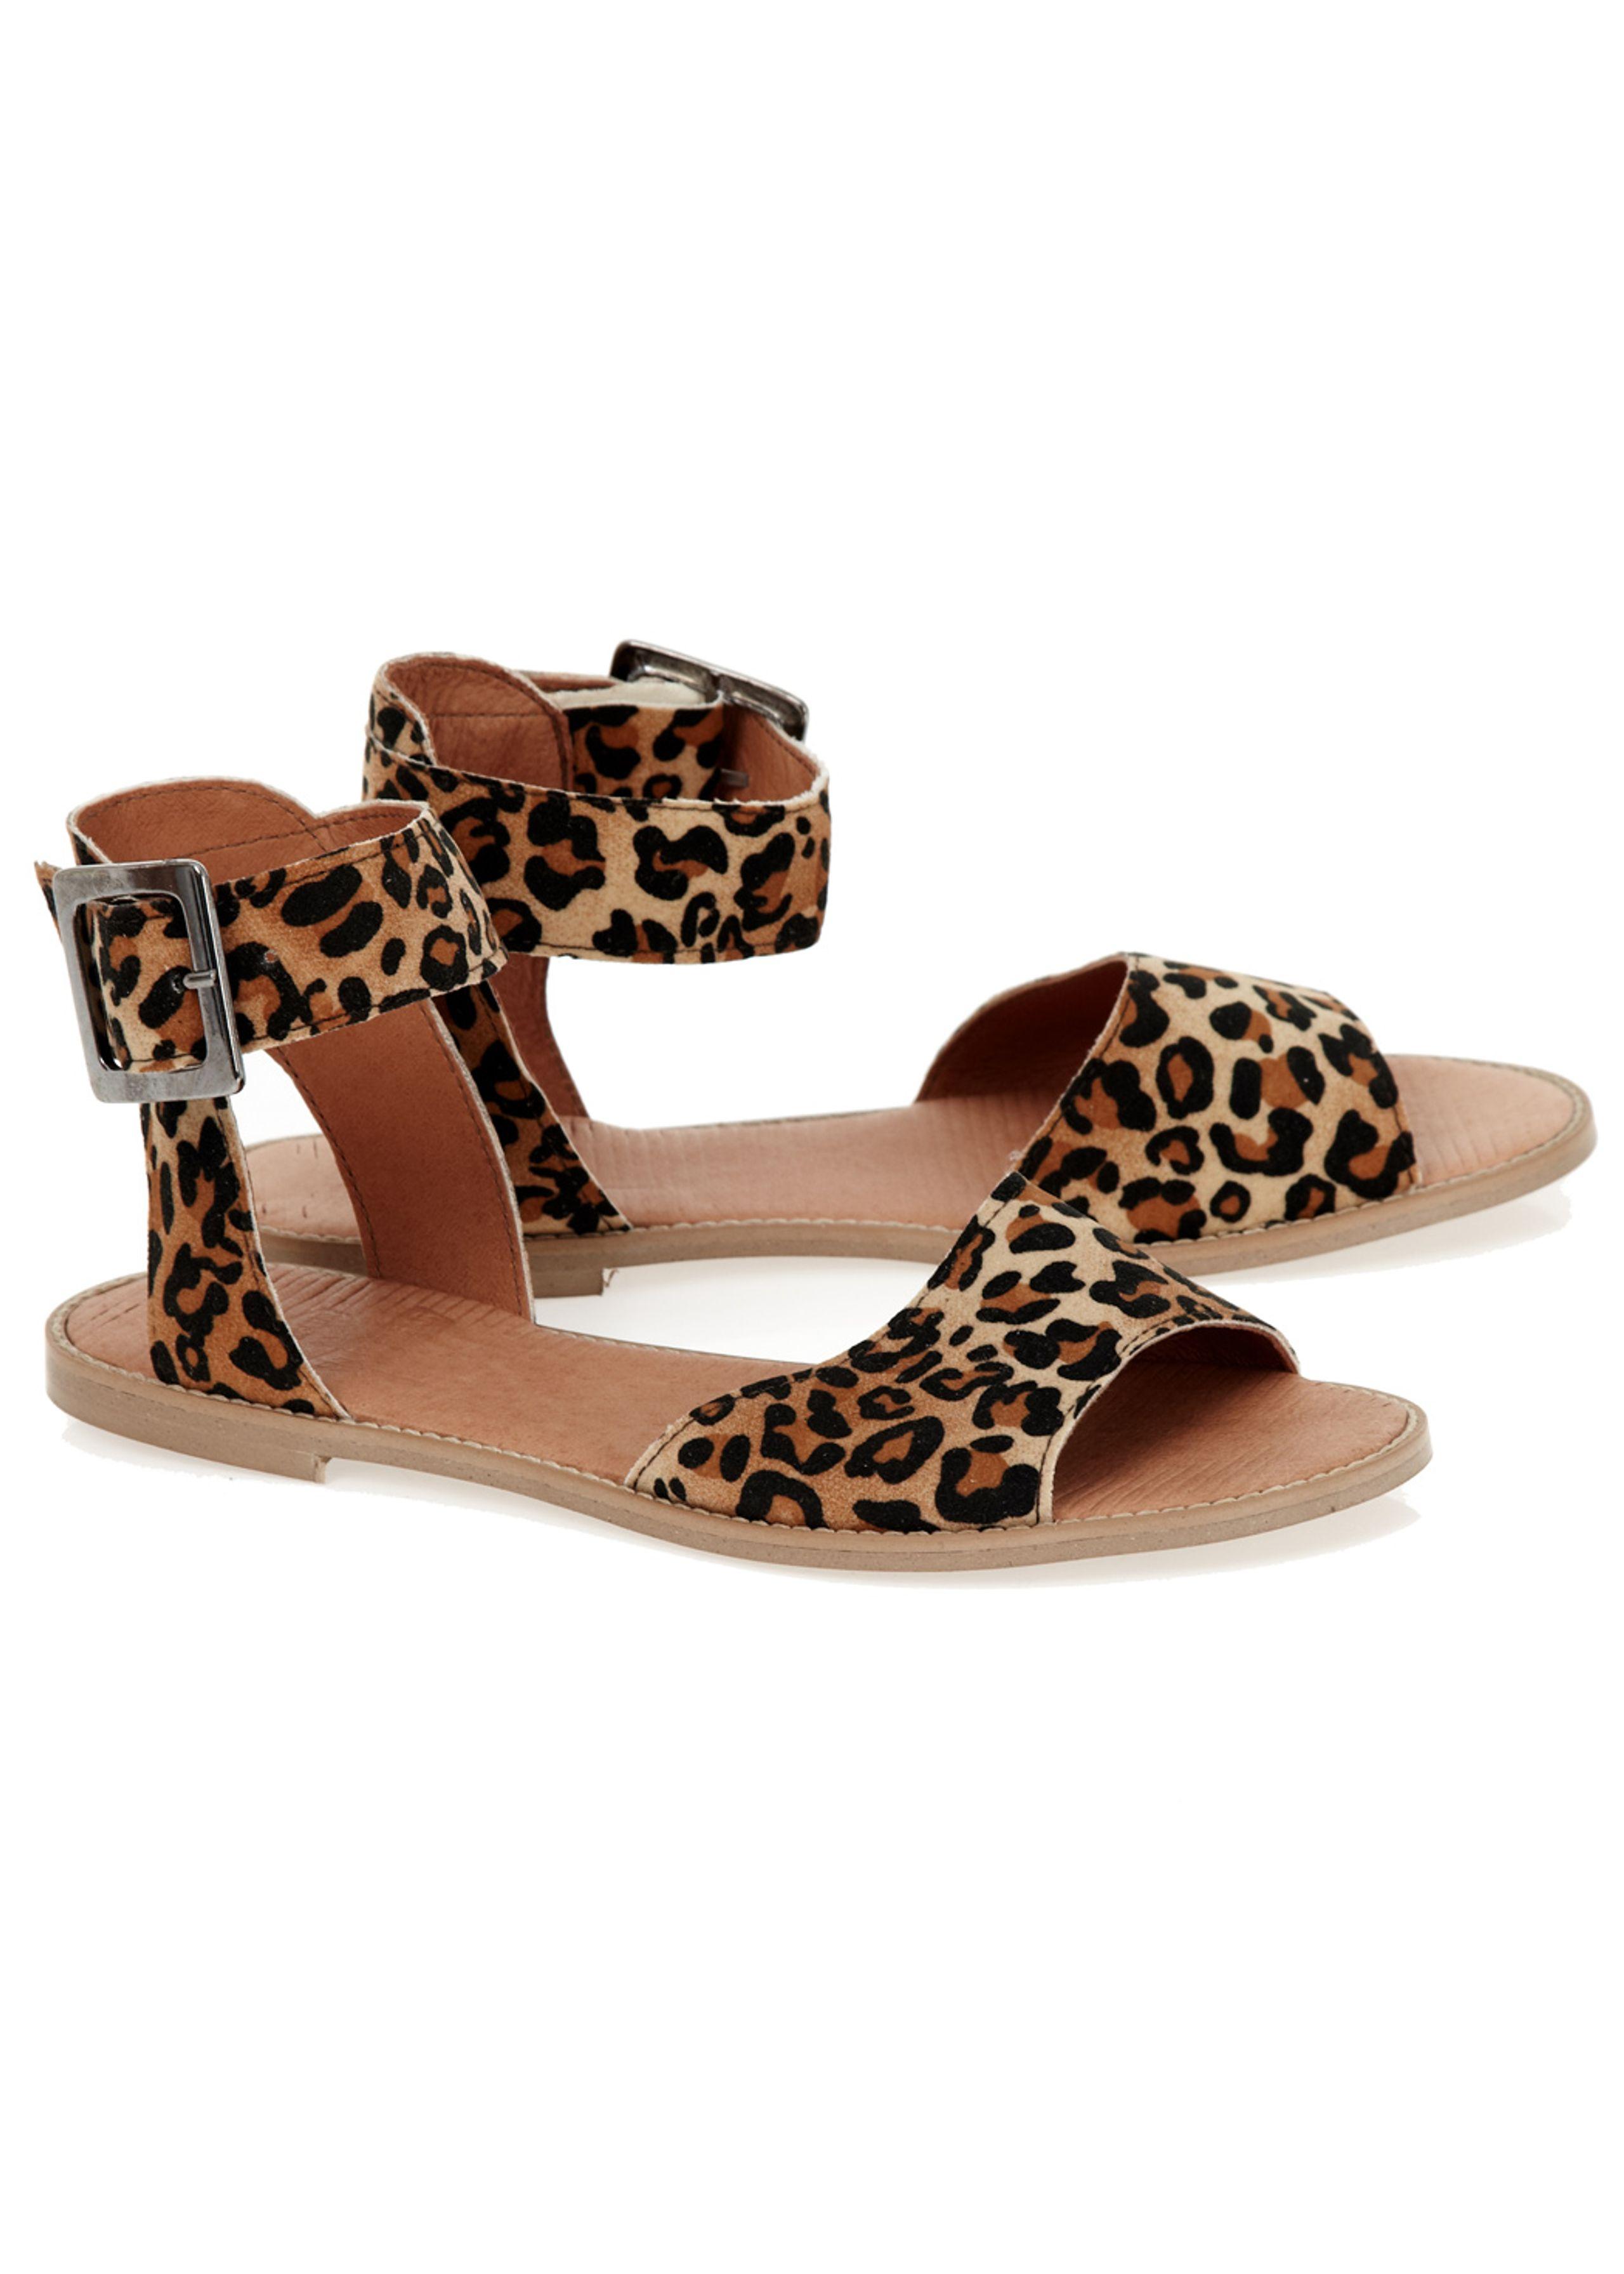 Sandal/one